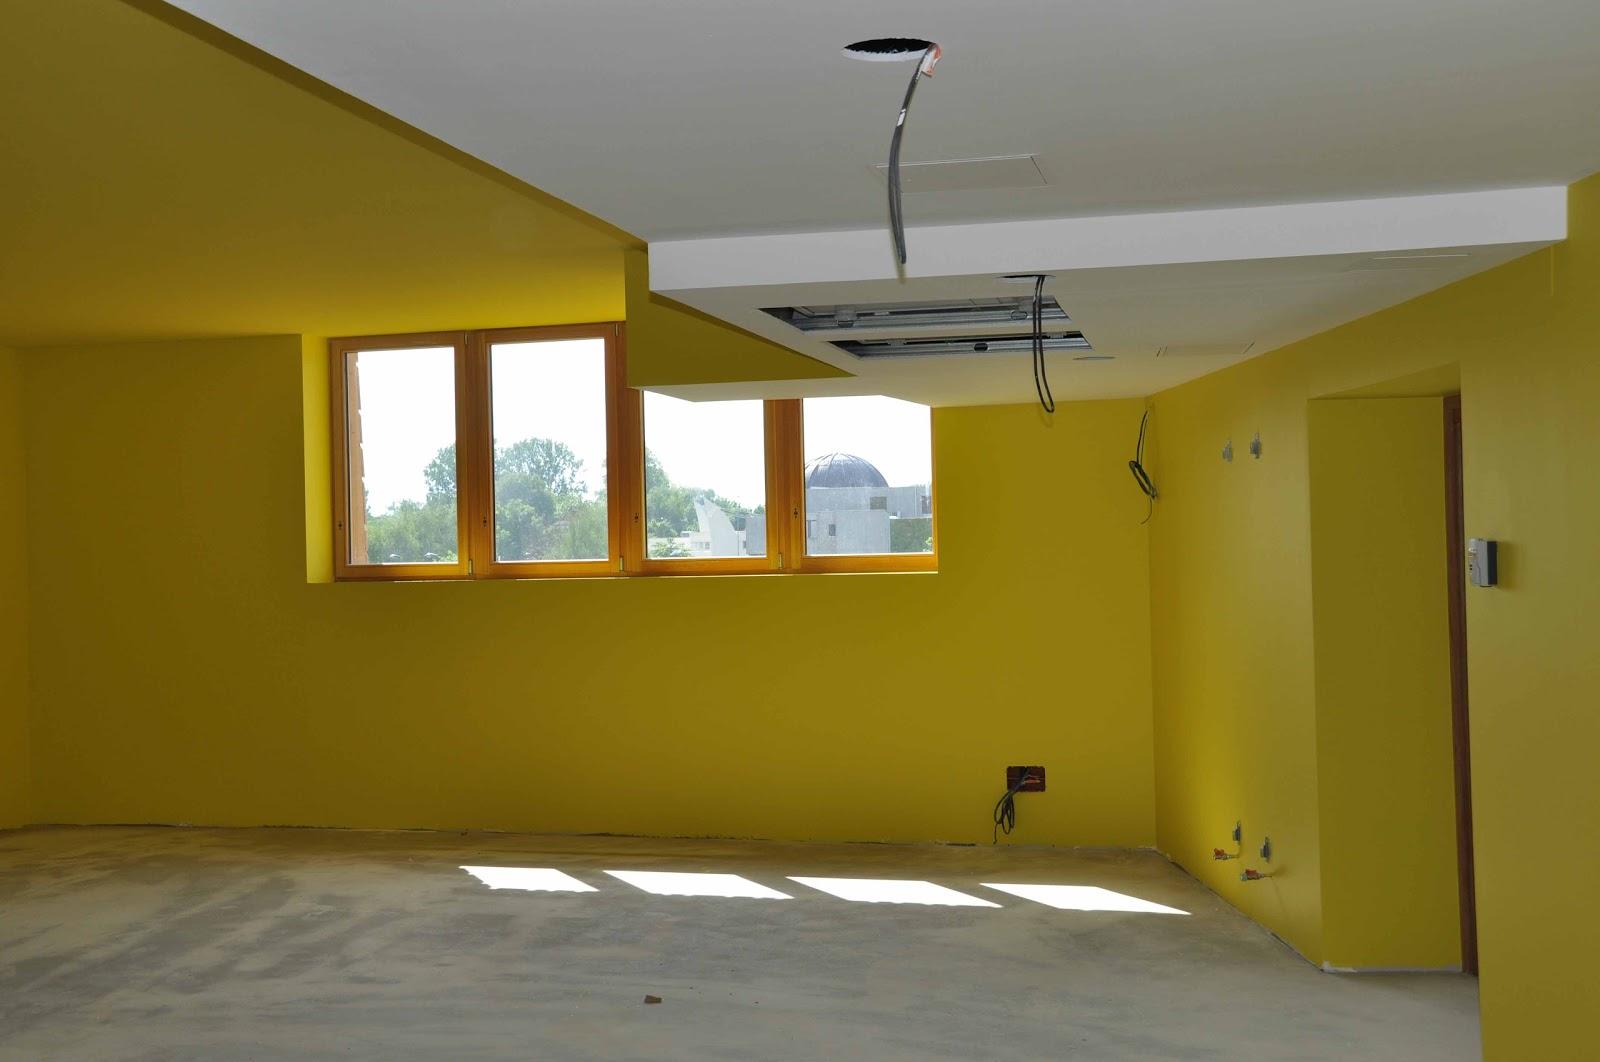 evolution du rowing club de strasbourg mai 2012. Black Bedroom Furniture Sets. Home Design Ideas